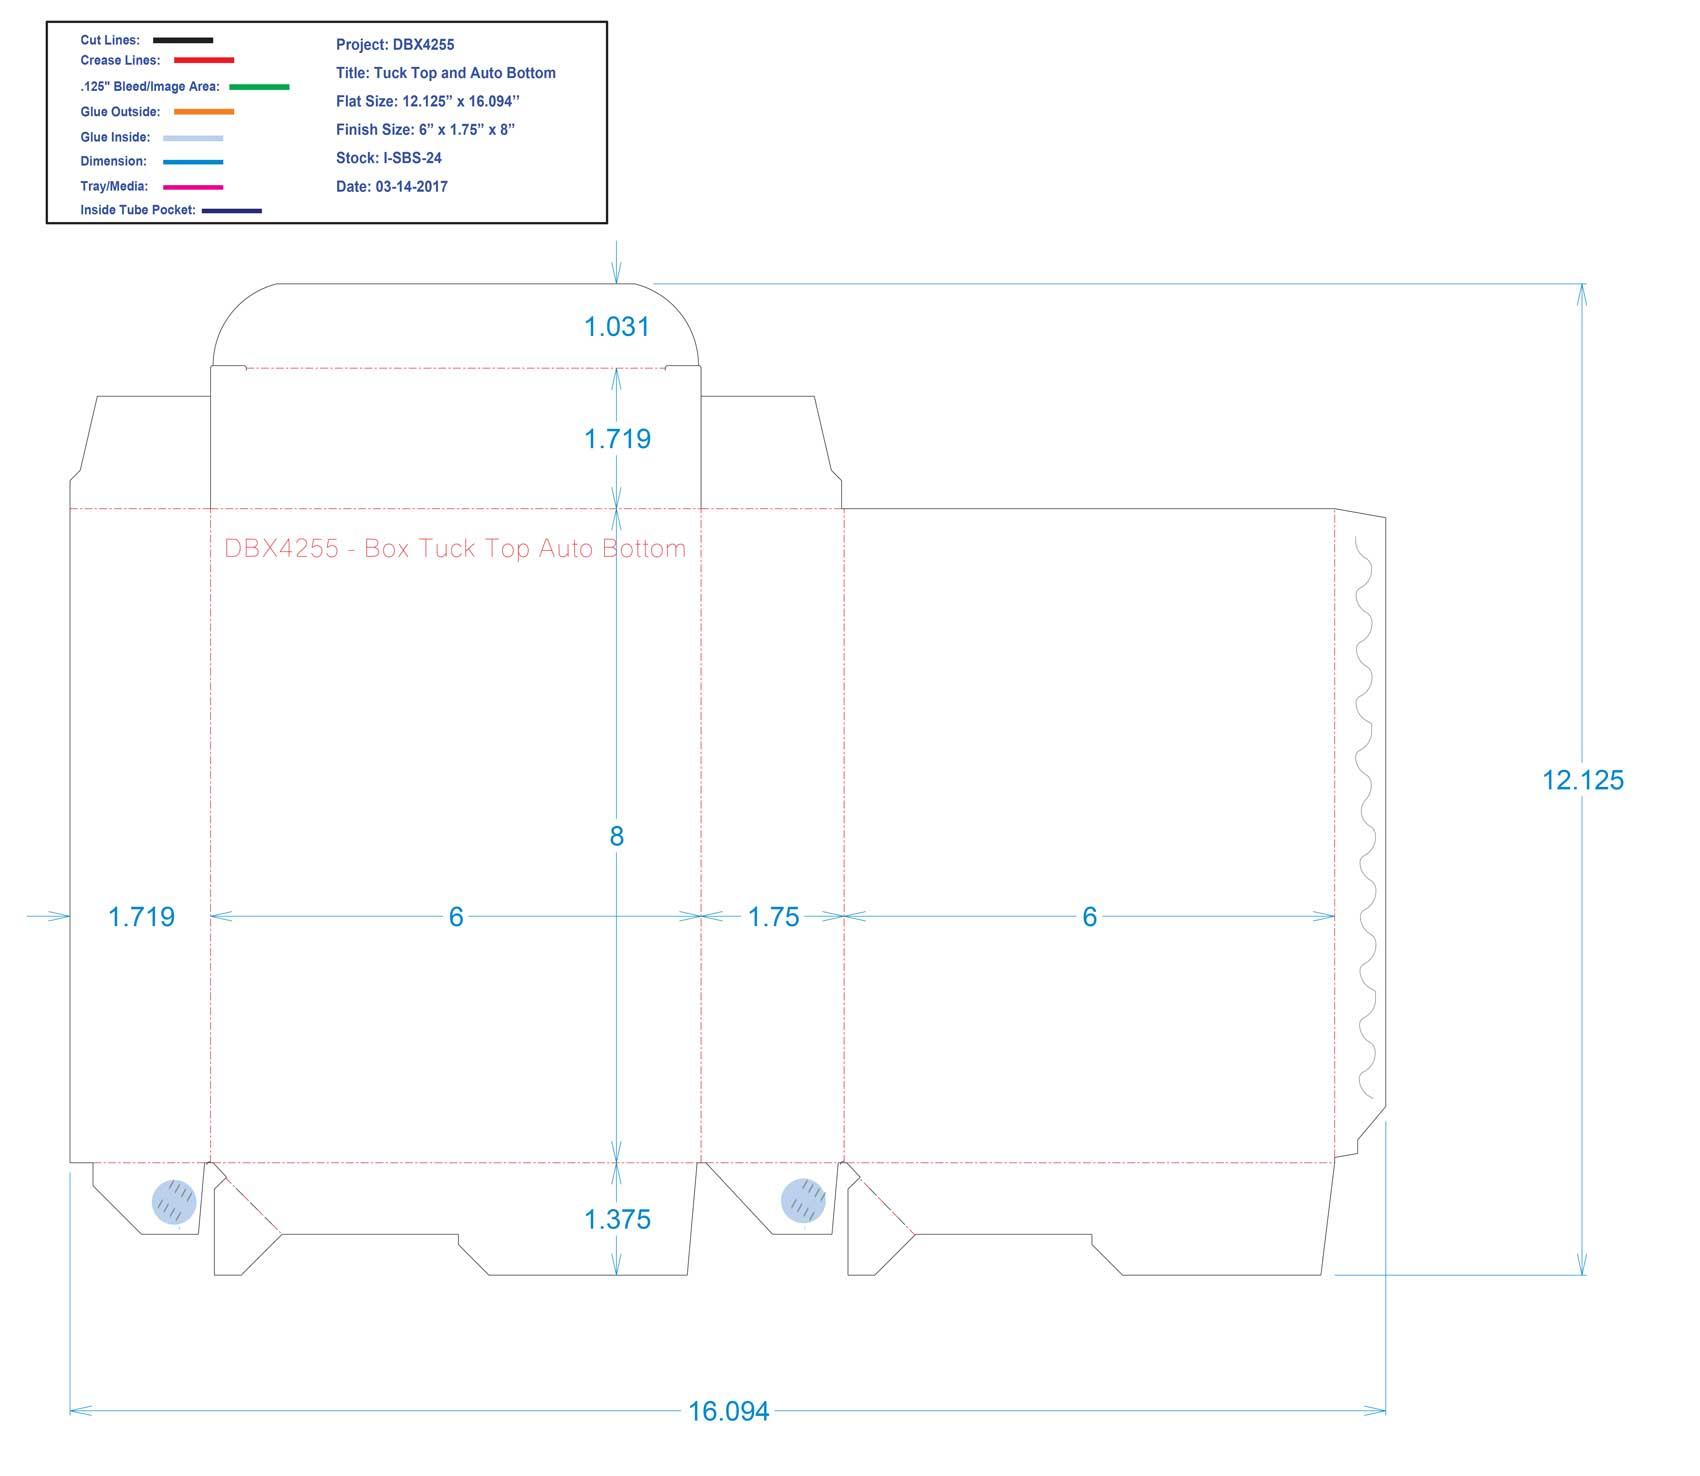 DBX4255- Box Tuck Top Auto Bottom